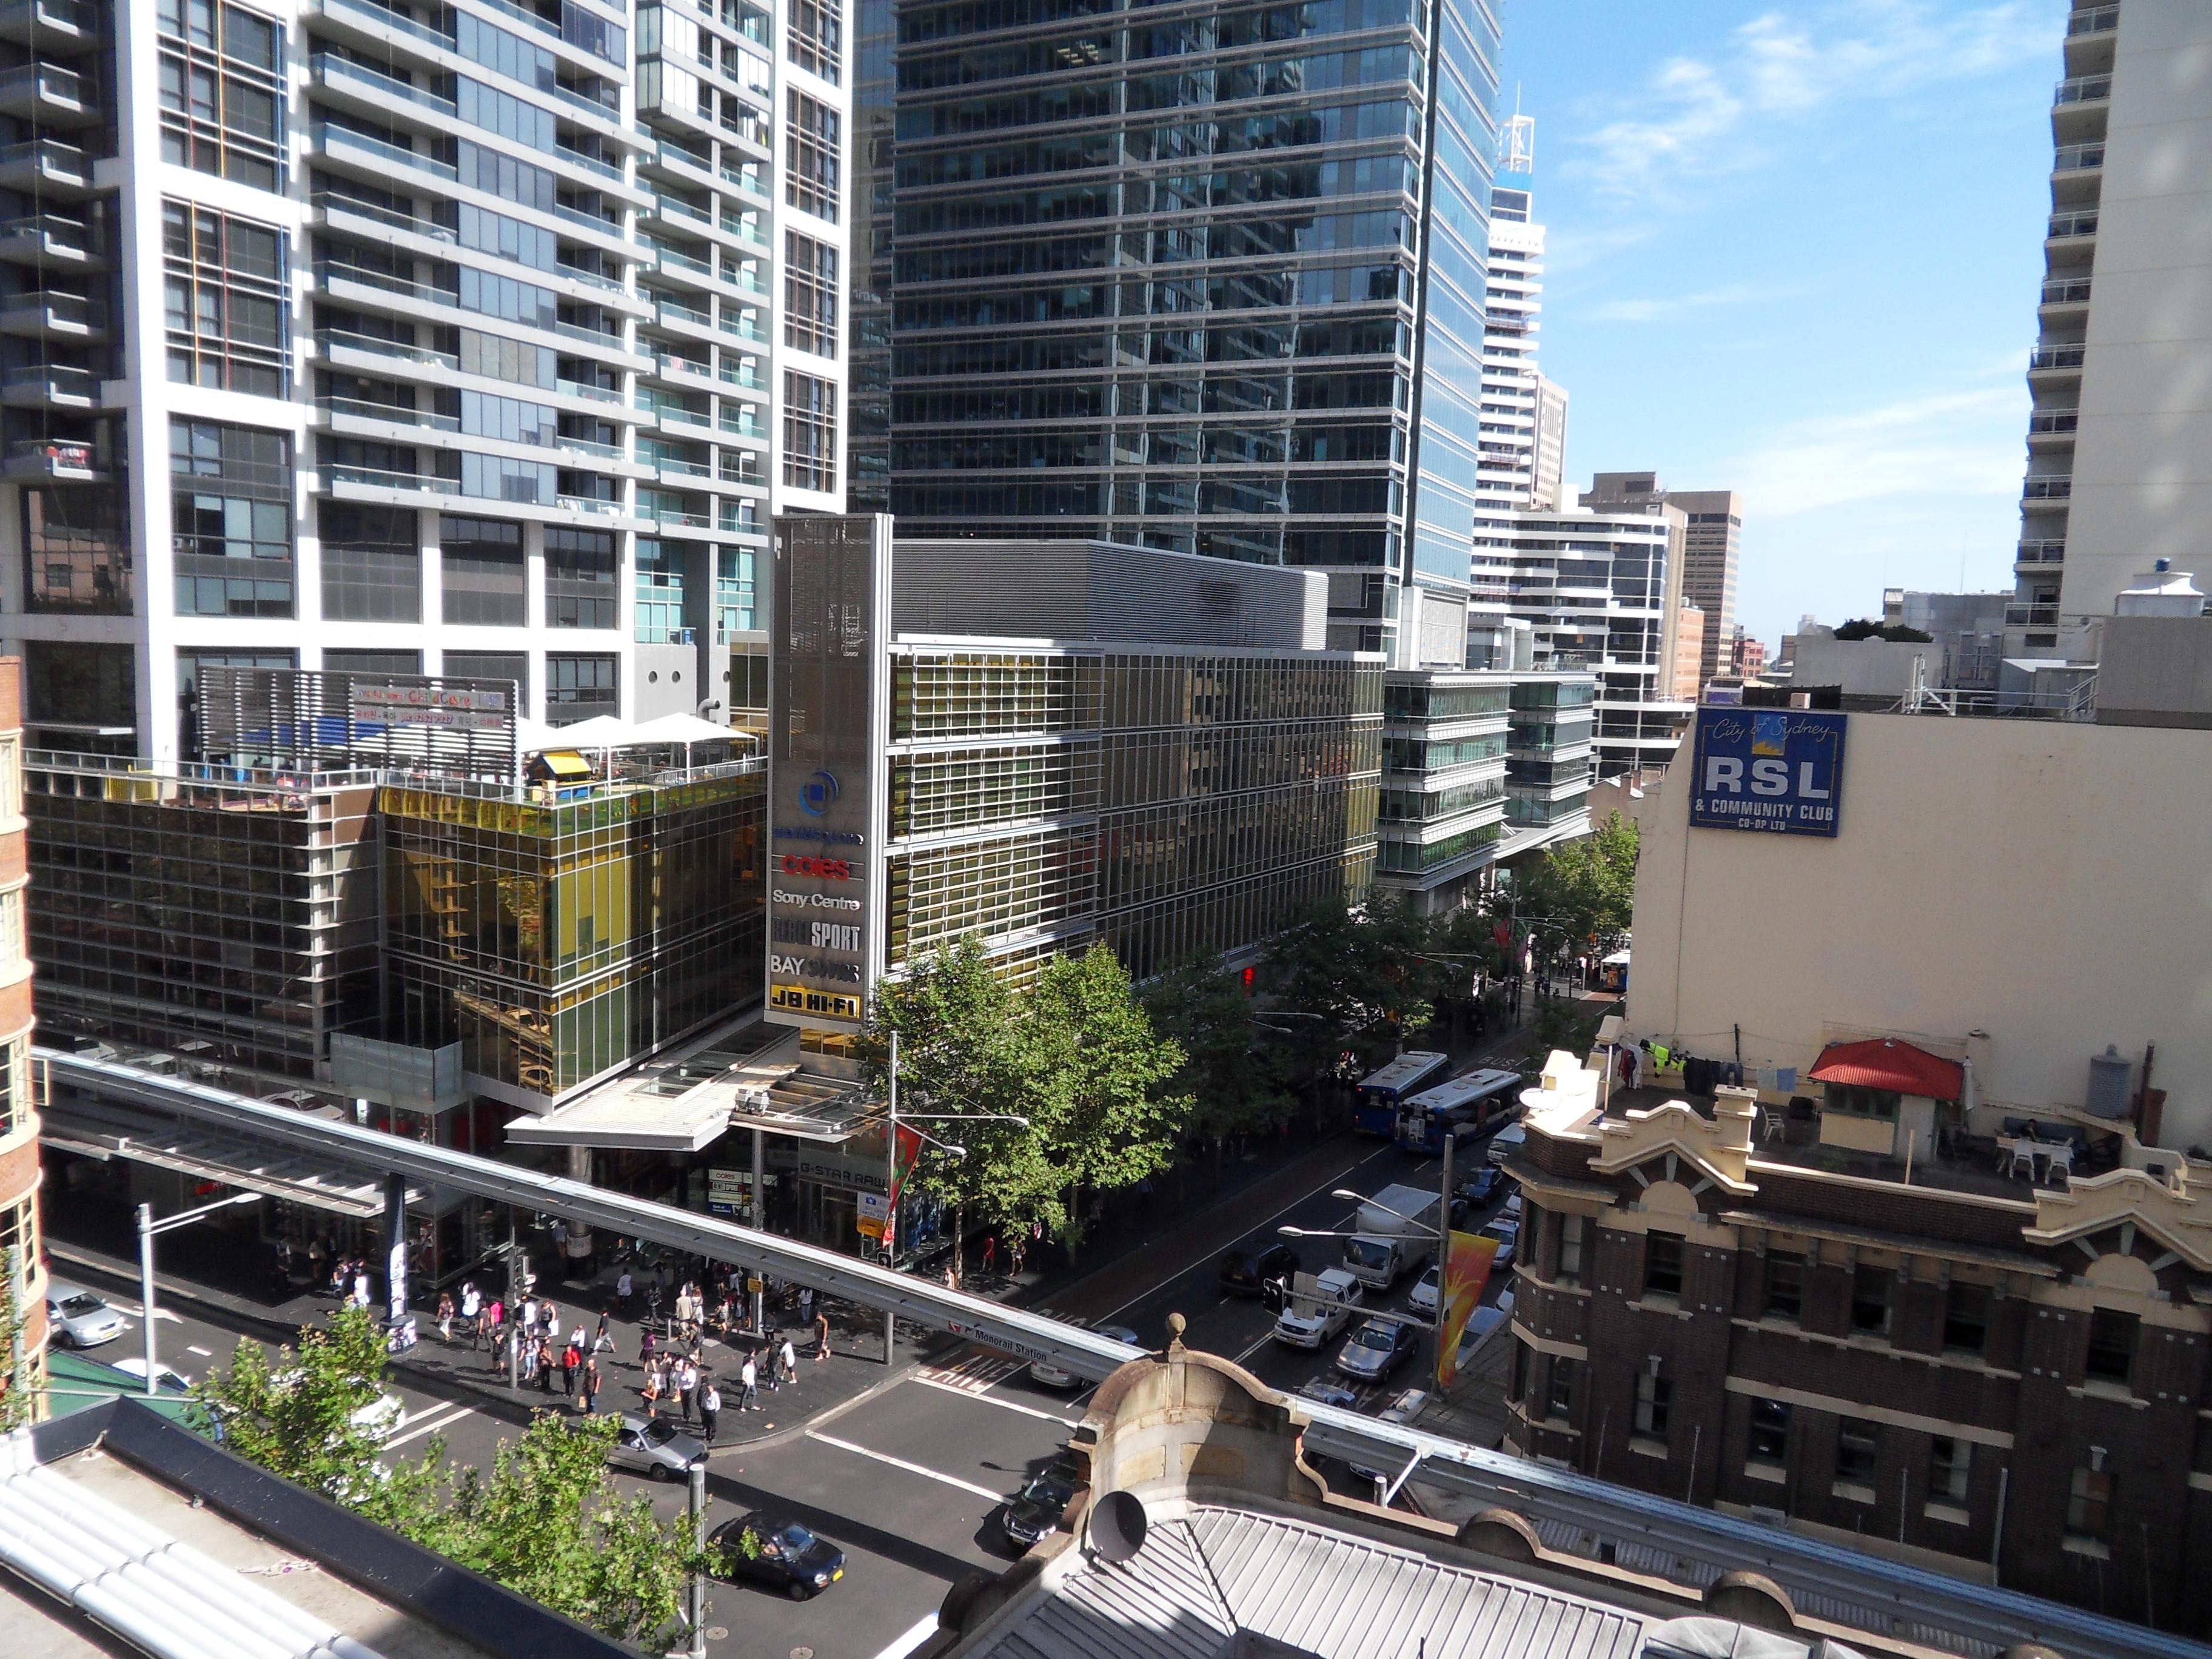 Date squares in Sydney